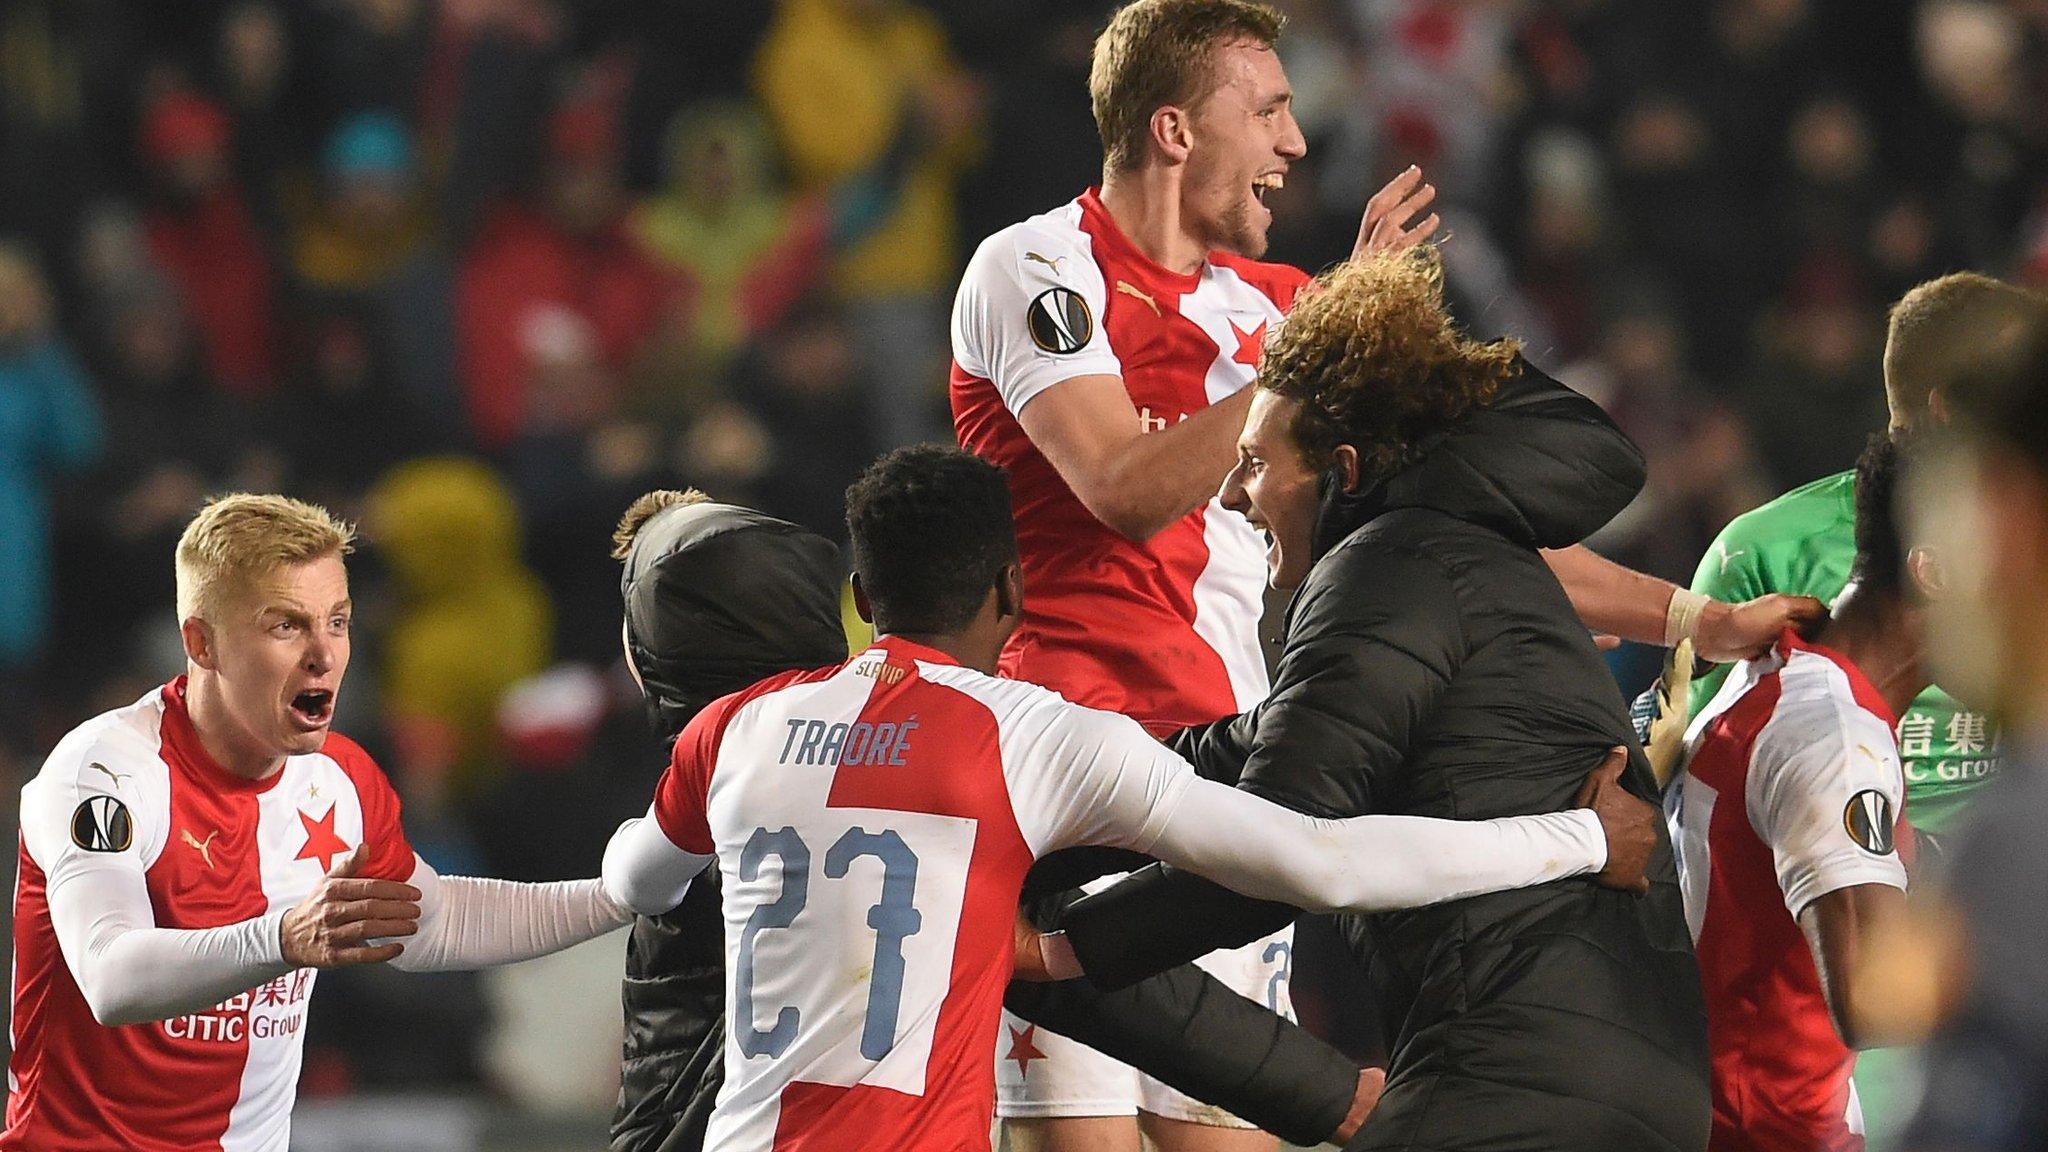 Slavie: Europa League Quarter-final Draw: Arsenal Face Napoli